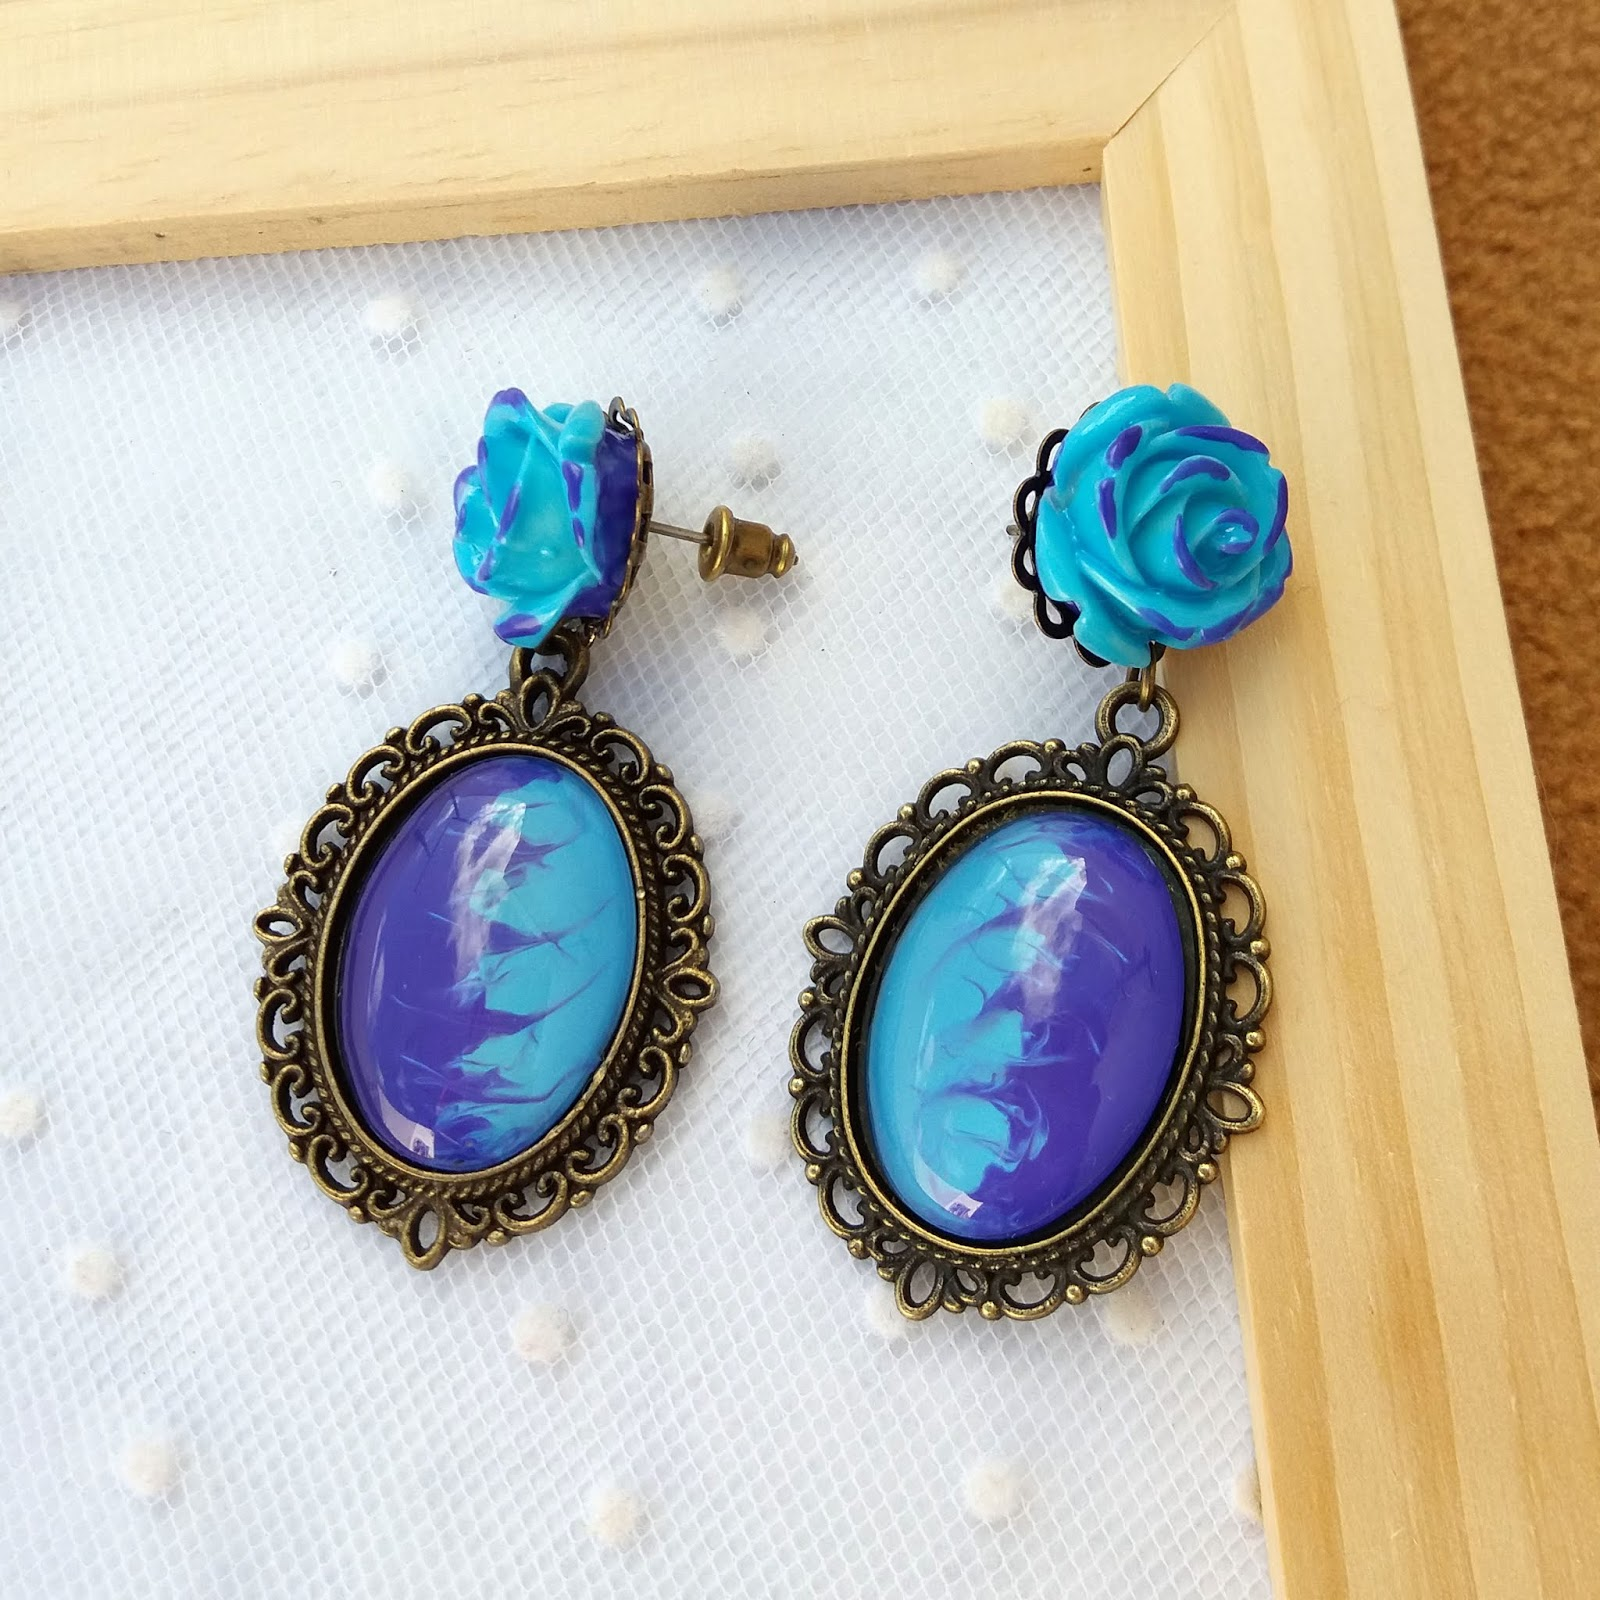 10 flores de cristal en violeta 9 mm